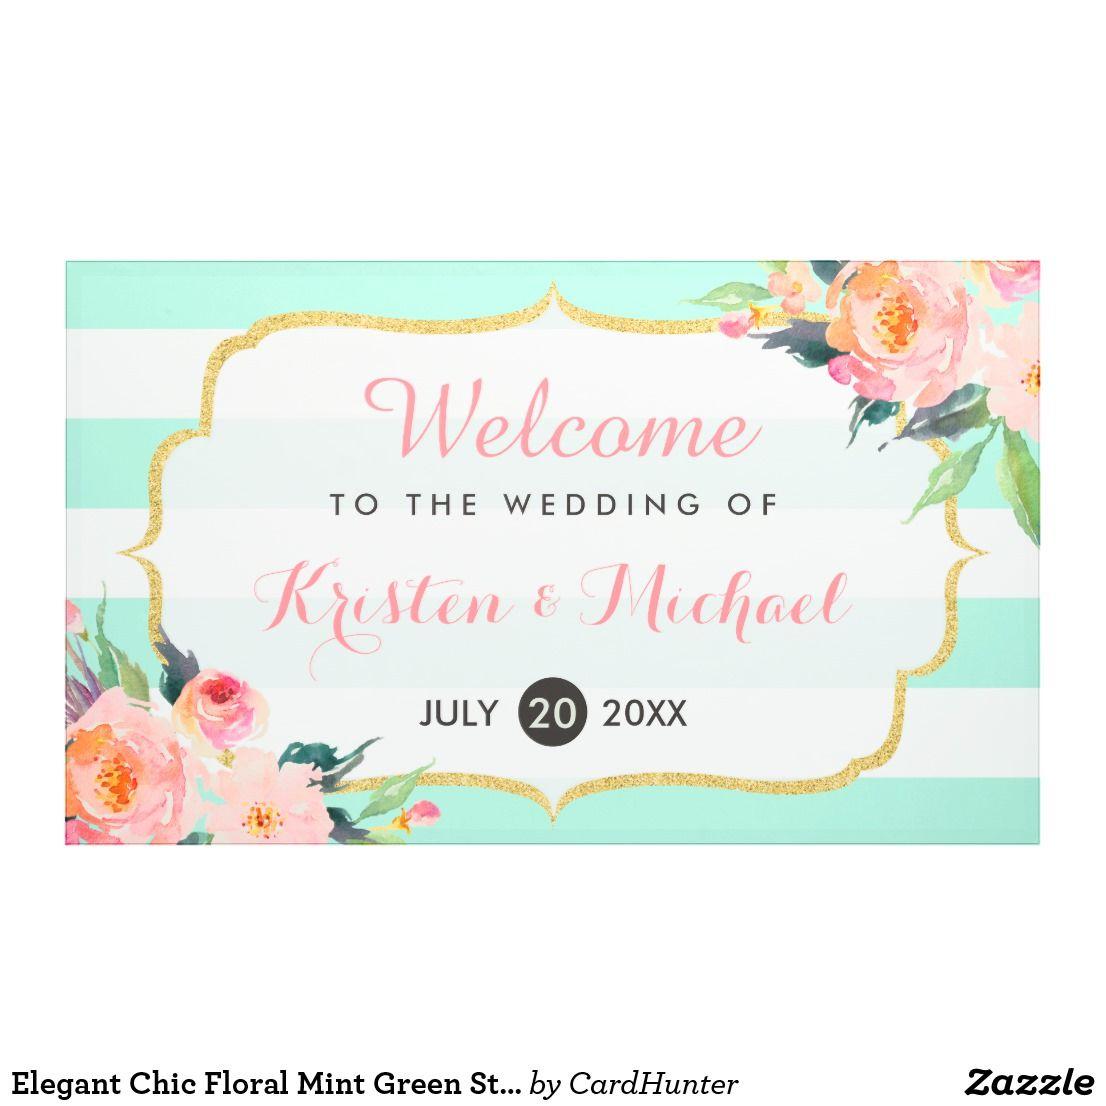 Elegant Chic Floral Mint Green Stripes Wedding Banner Zazzle Com